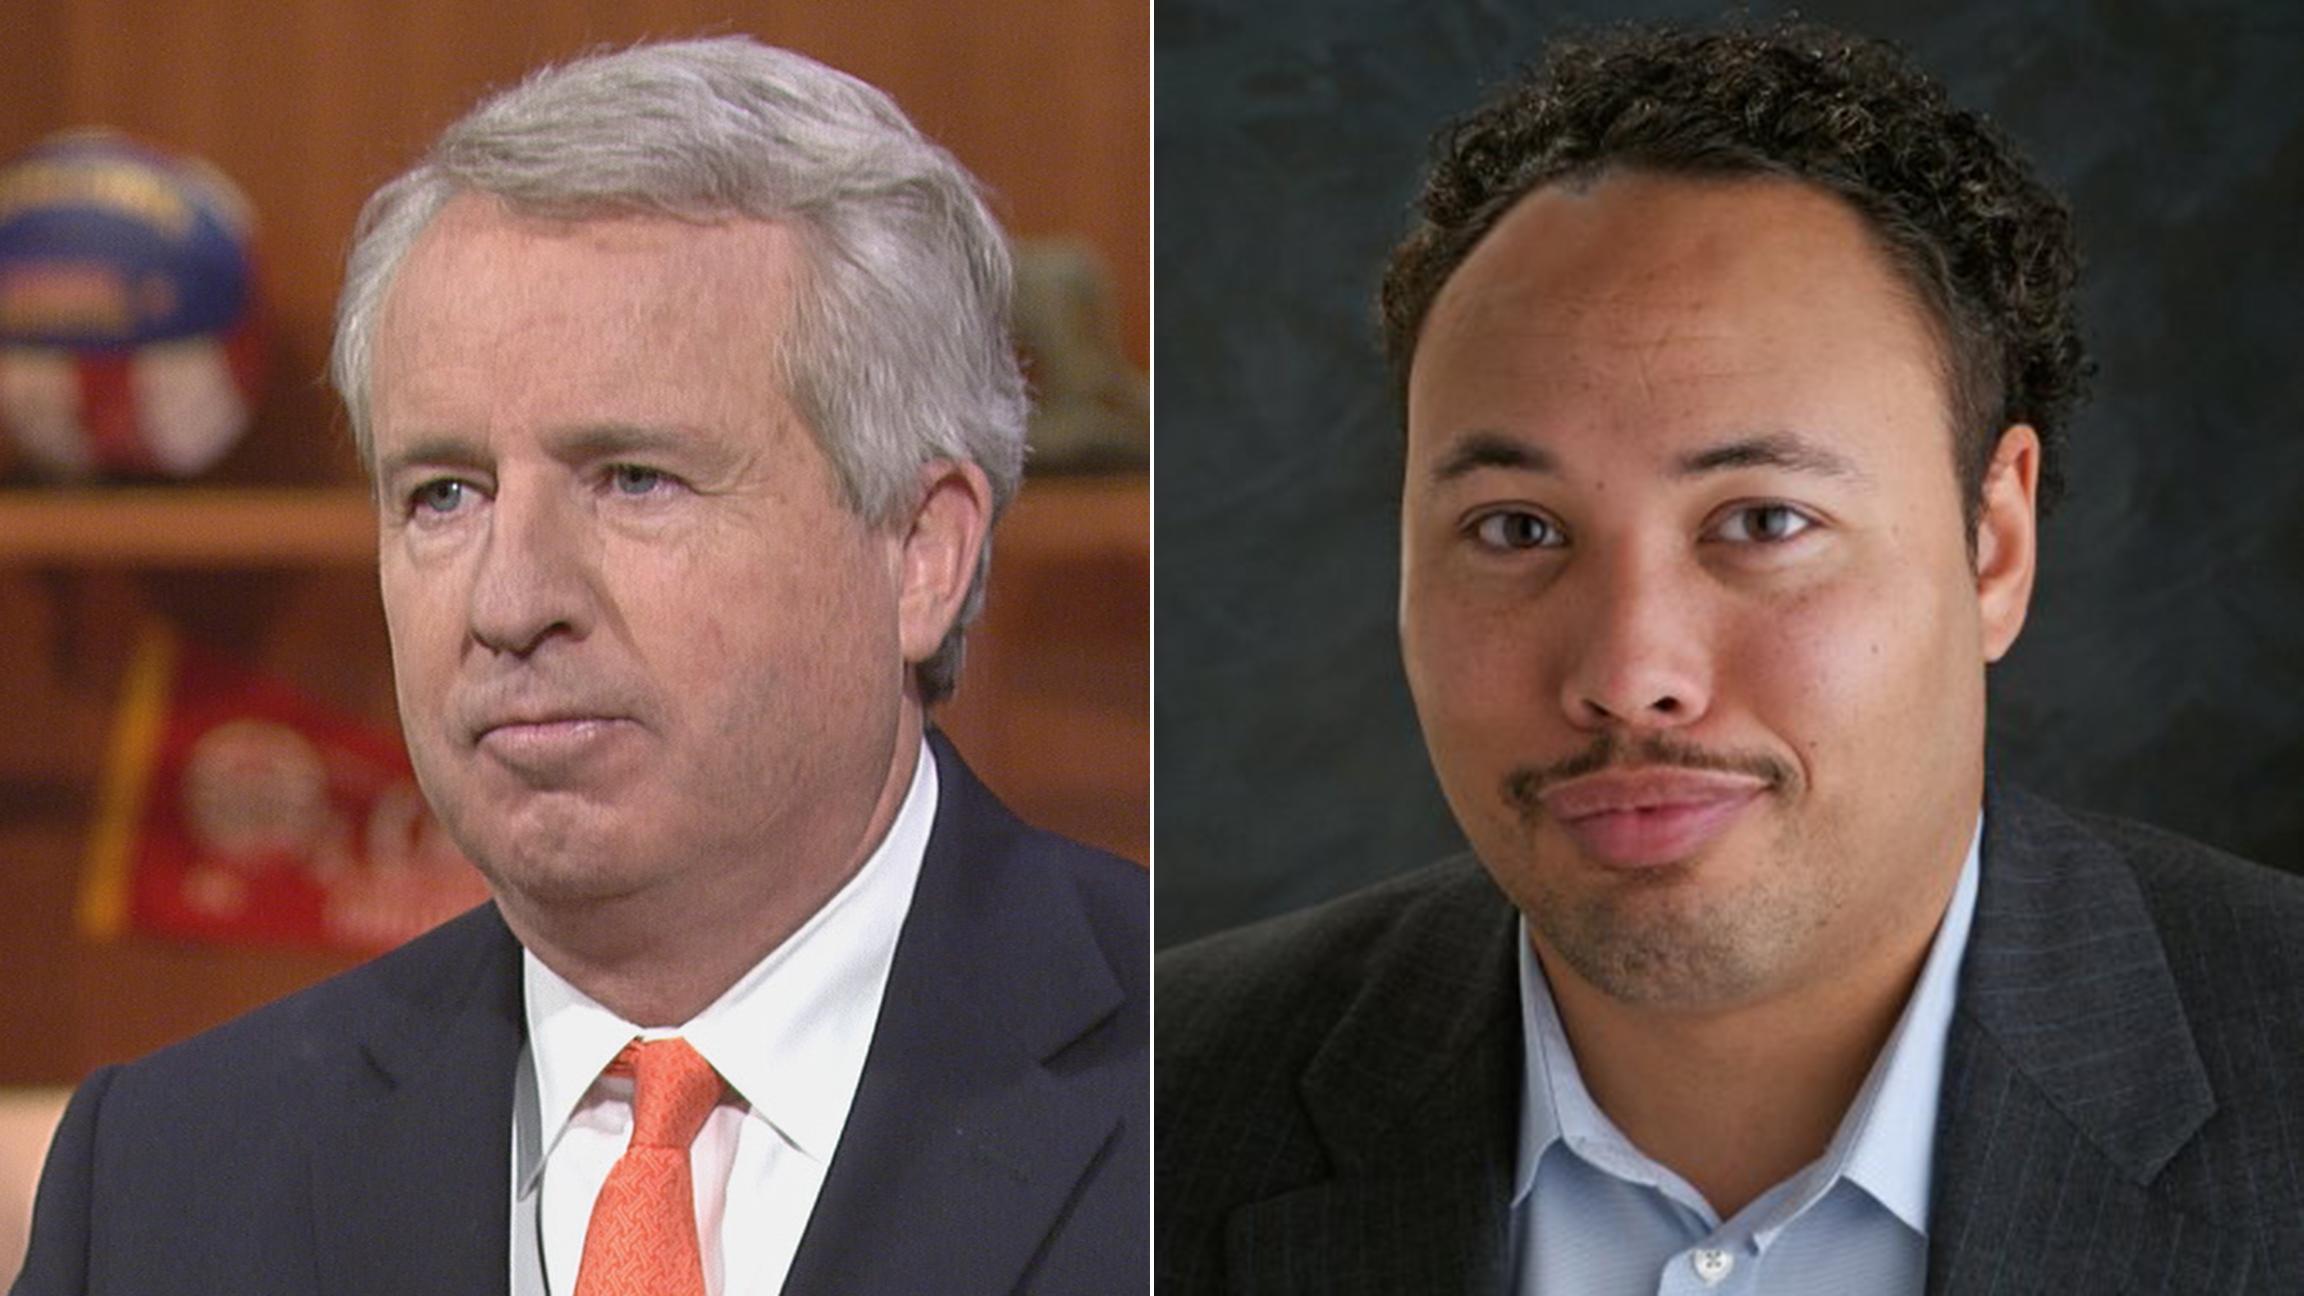 Ra Joy, Father Of Slain Xavier Joy, Joins Governor's Race With Kennedy